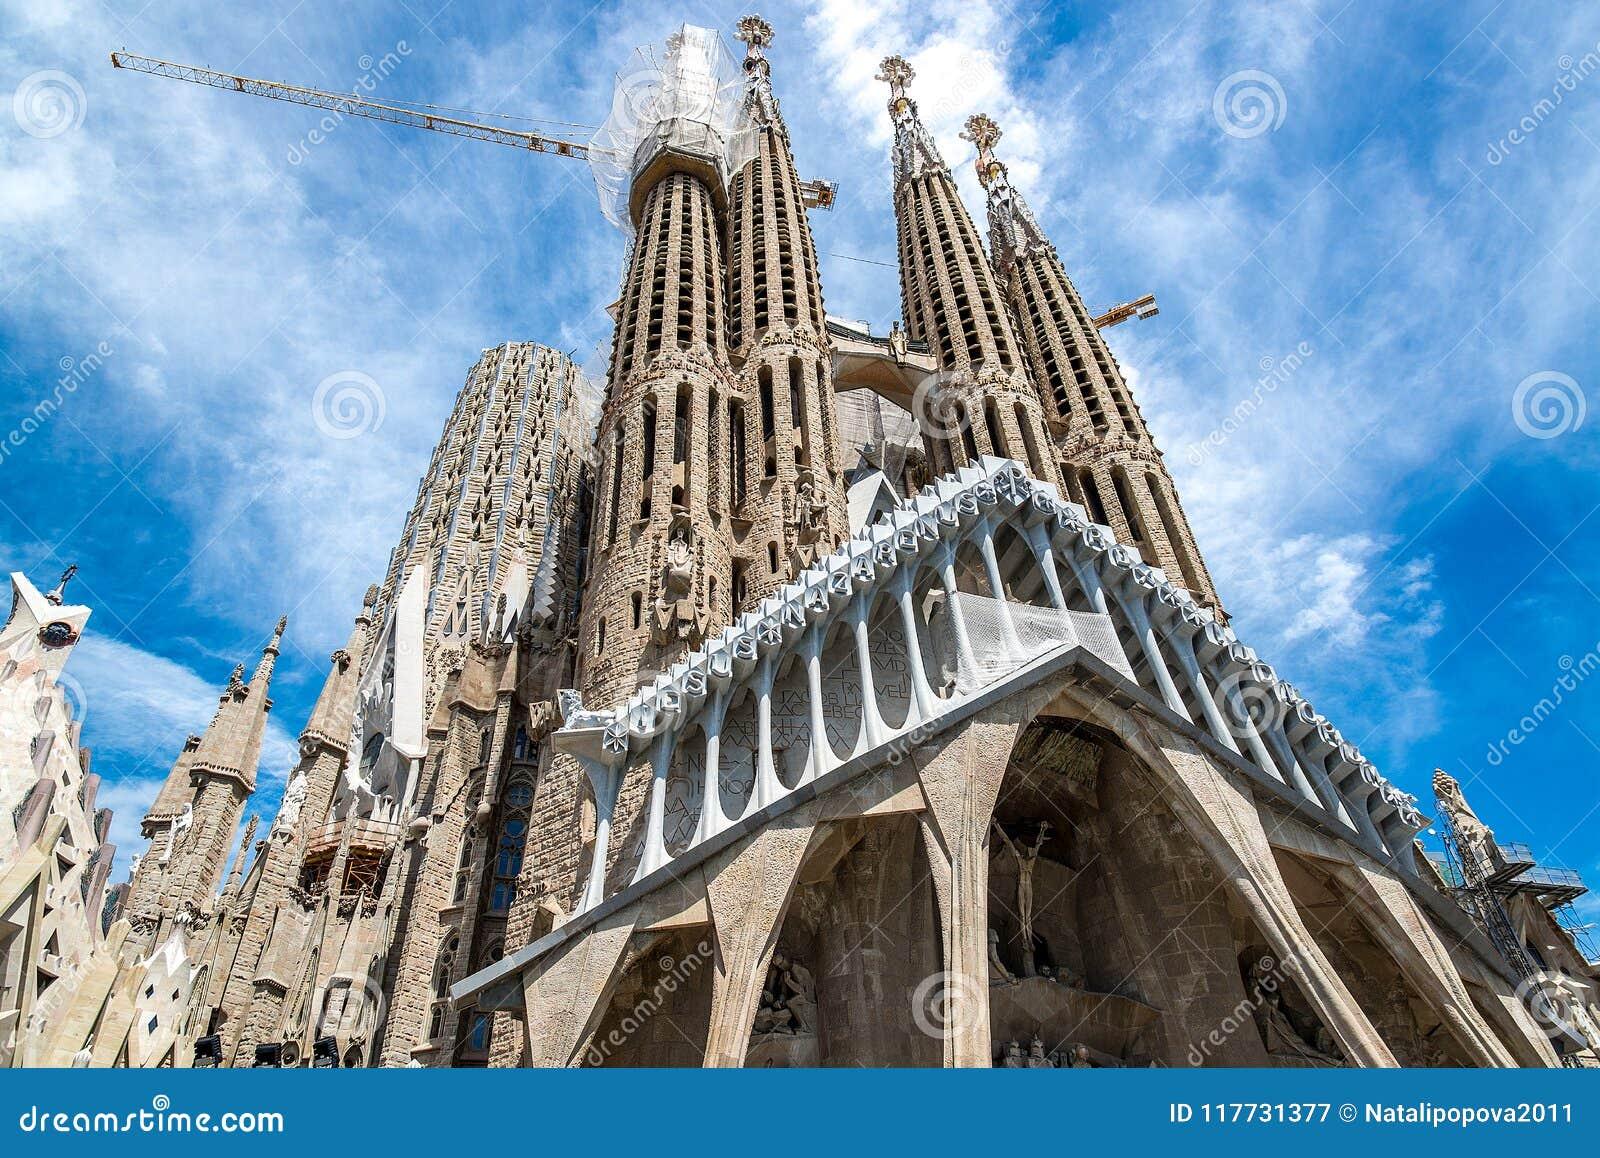 The Cathedral of La Sagrada Familia by the architect Antonio Gaudi, Catalonia, Barcelona Spain - May 15, 2018.